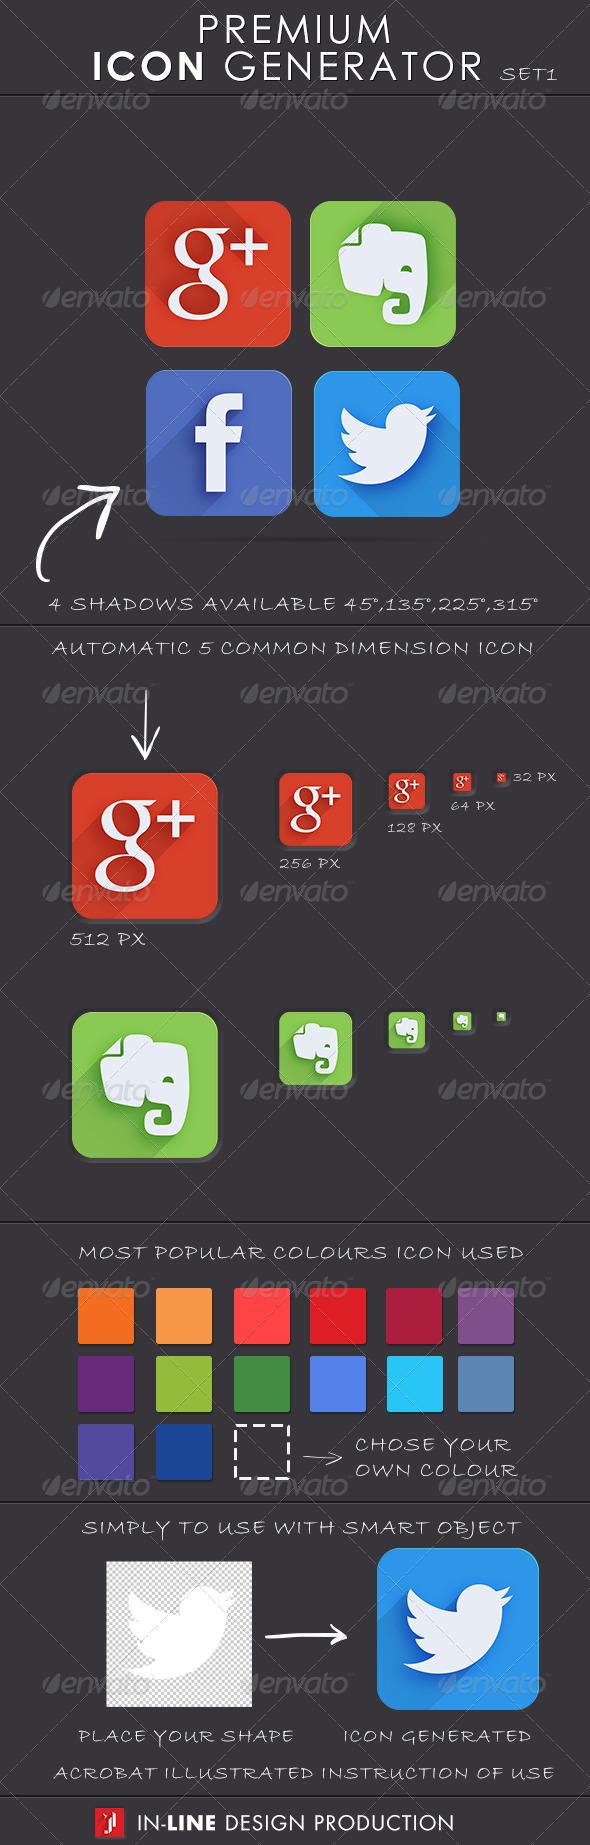 Premium Icon Generator Set.1 - Icons